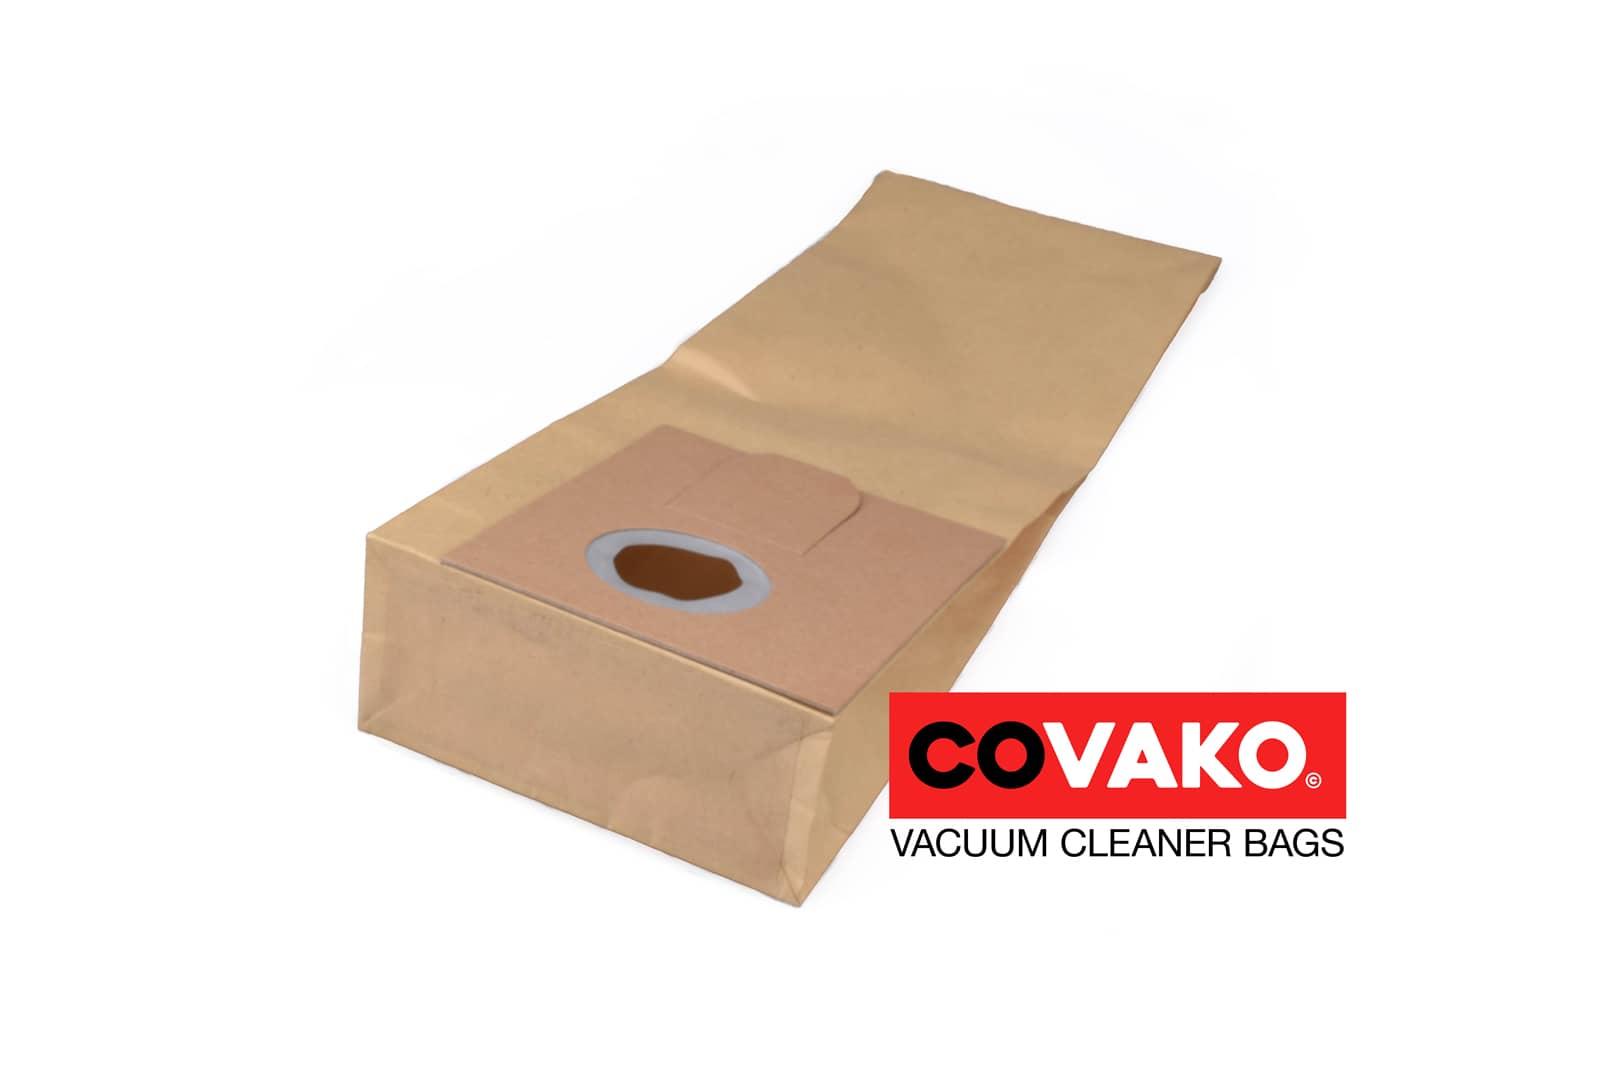 Ivac UP 350 / Paper - Ivac vacuum cleaner bags